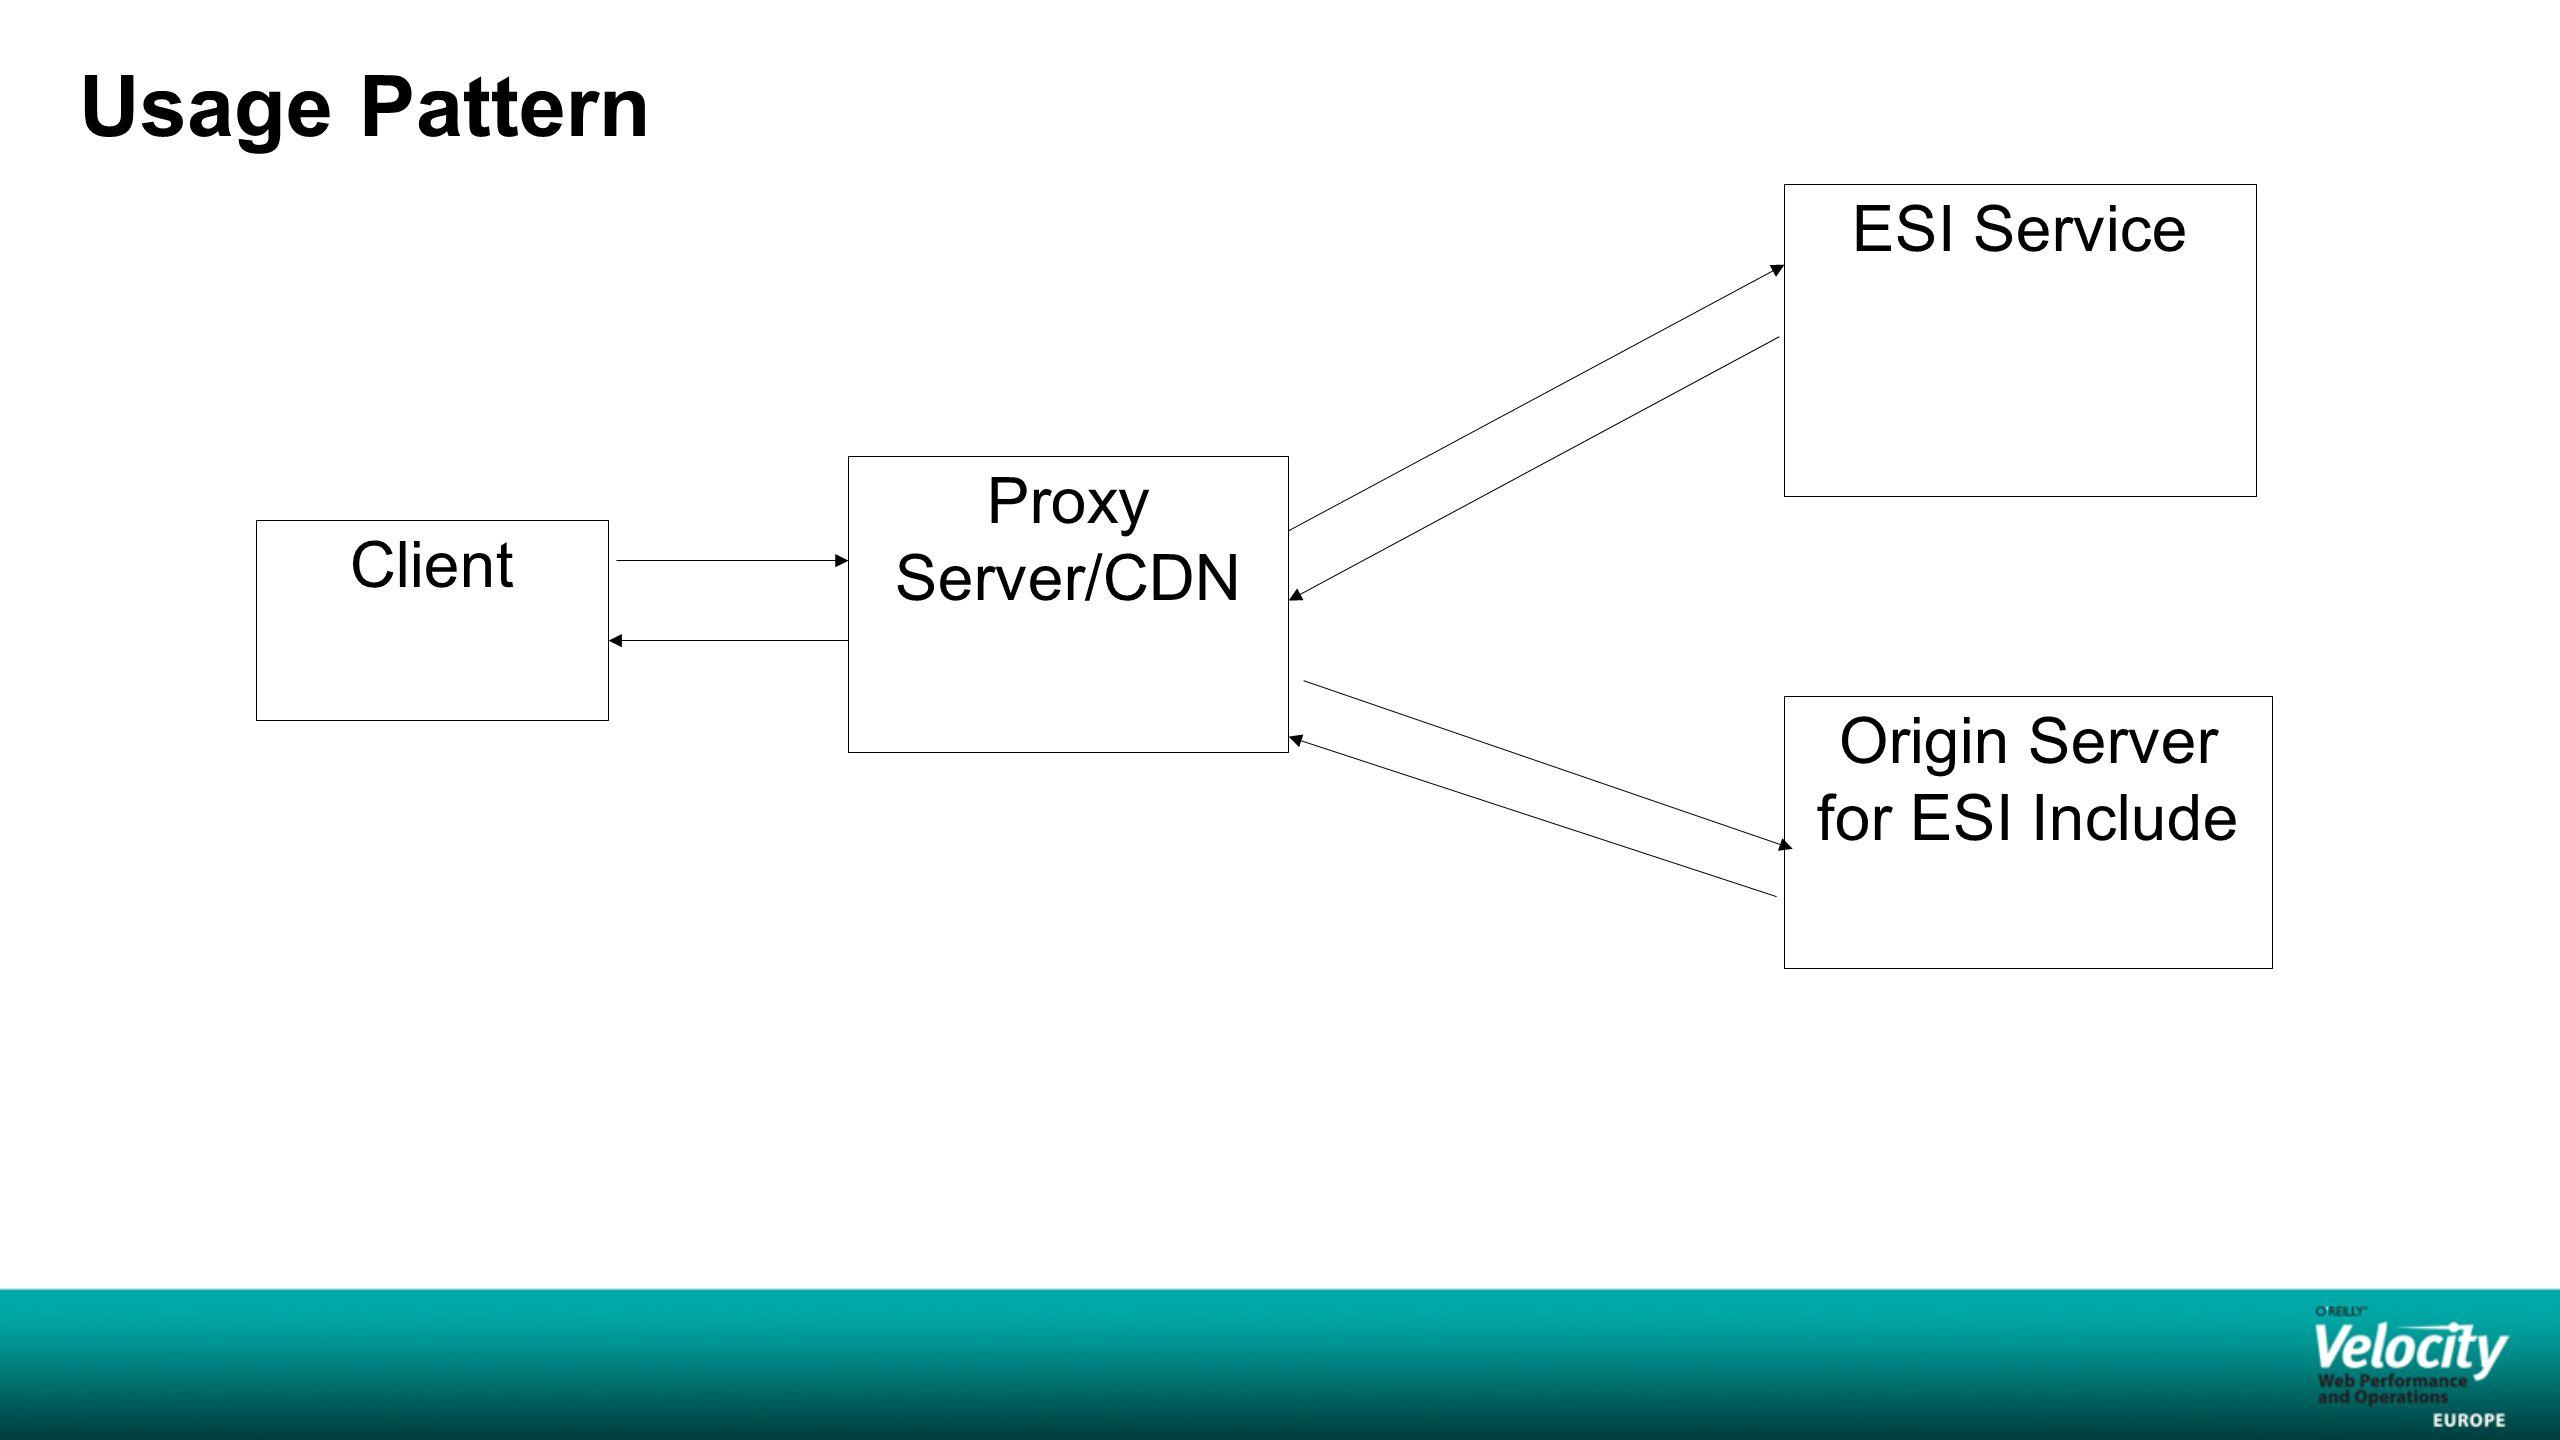 Usage Pattern Client Proxy Server/CDN ESI Service Origin Server for ESI Include